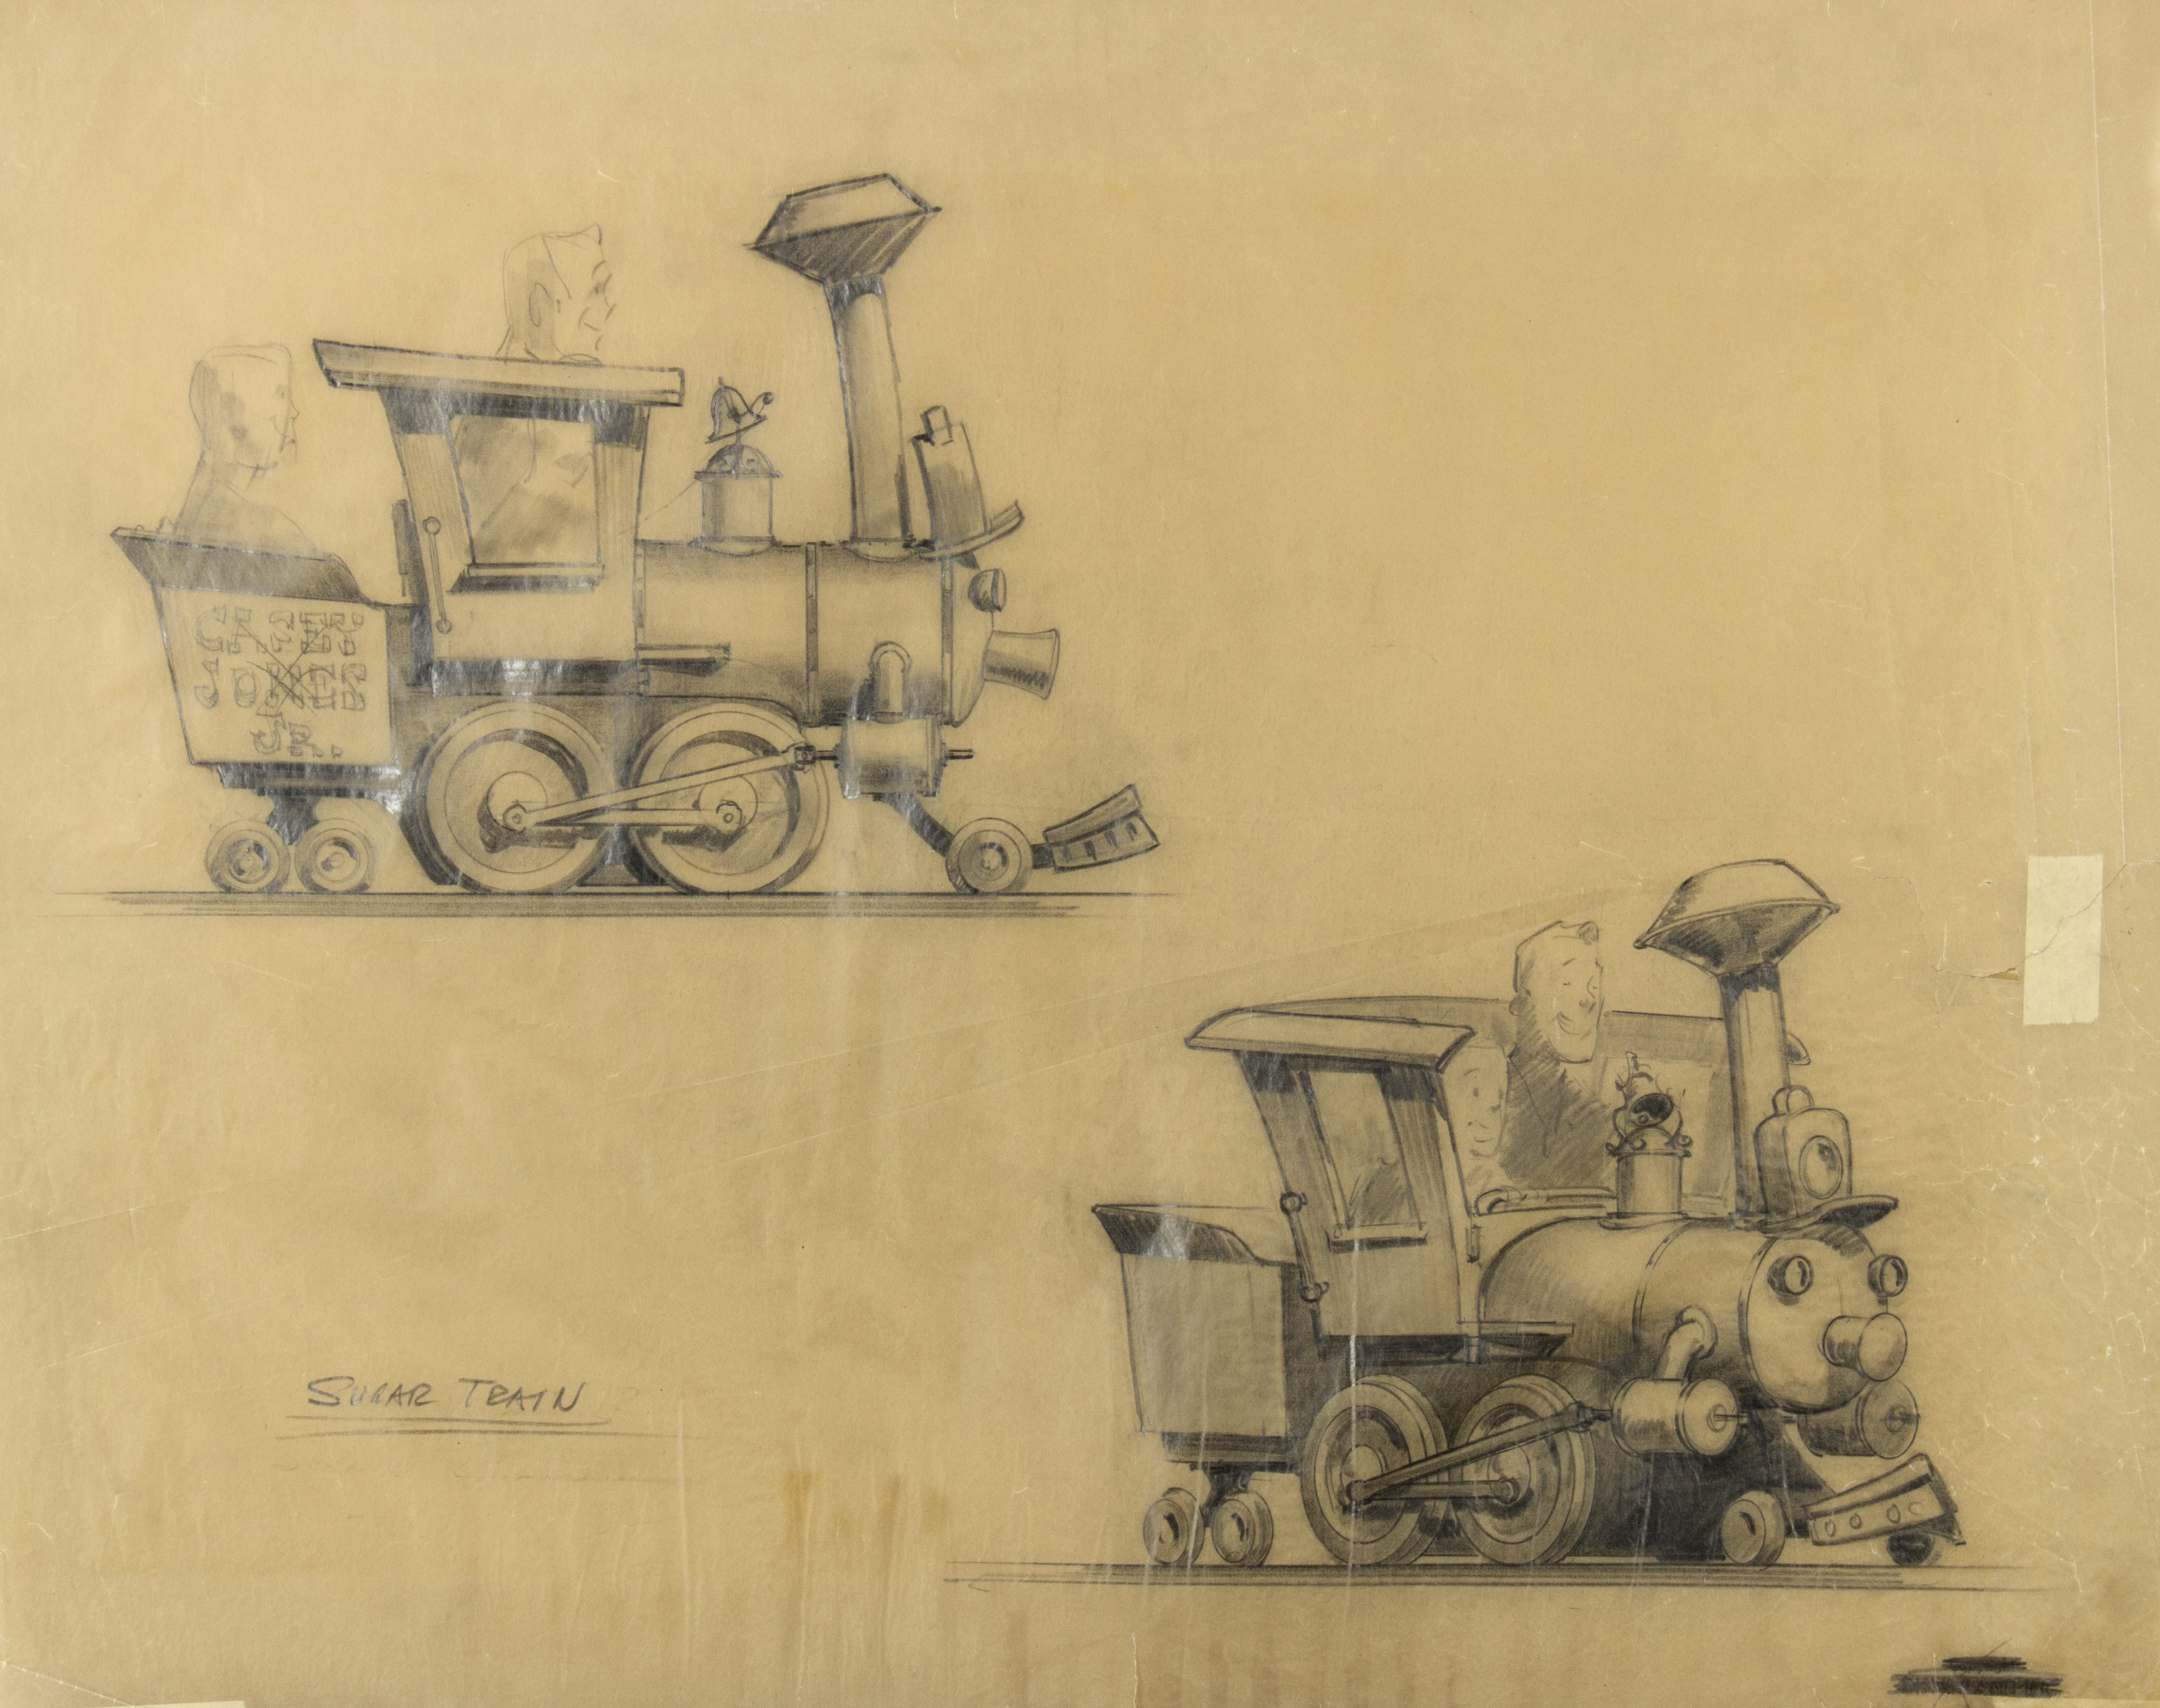 Casey Jones Sugar Train concept drawing, by Imagineer Bruce Bushman, 1950s